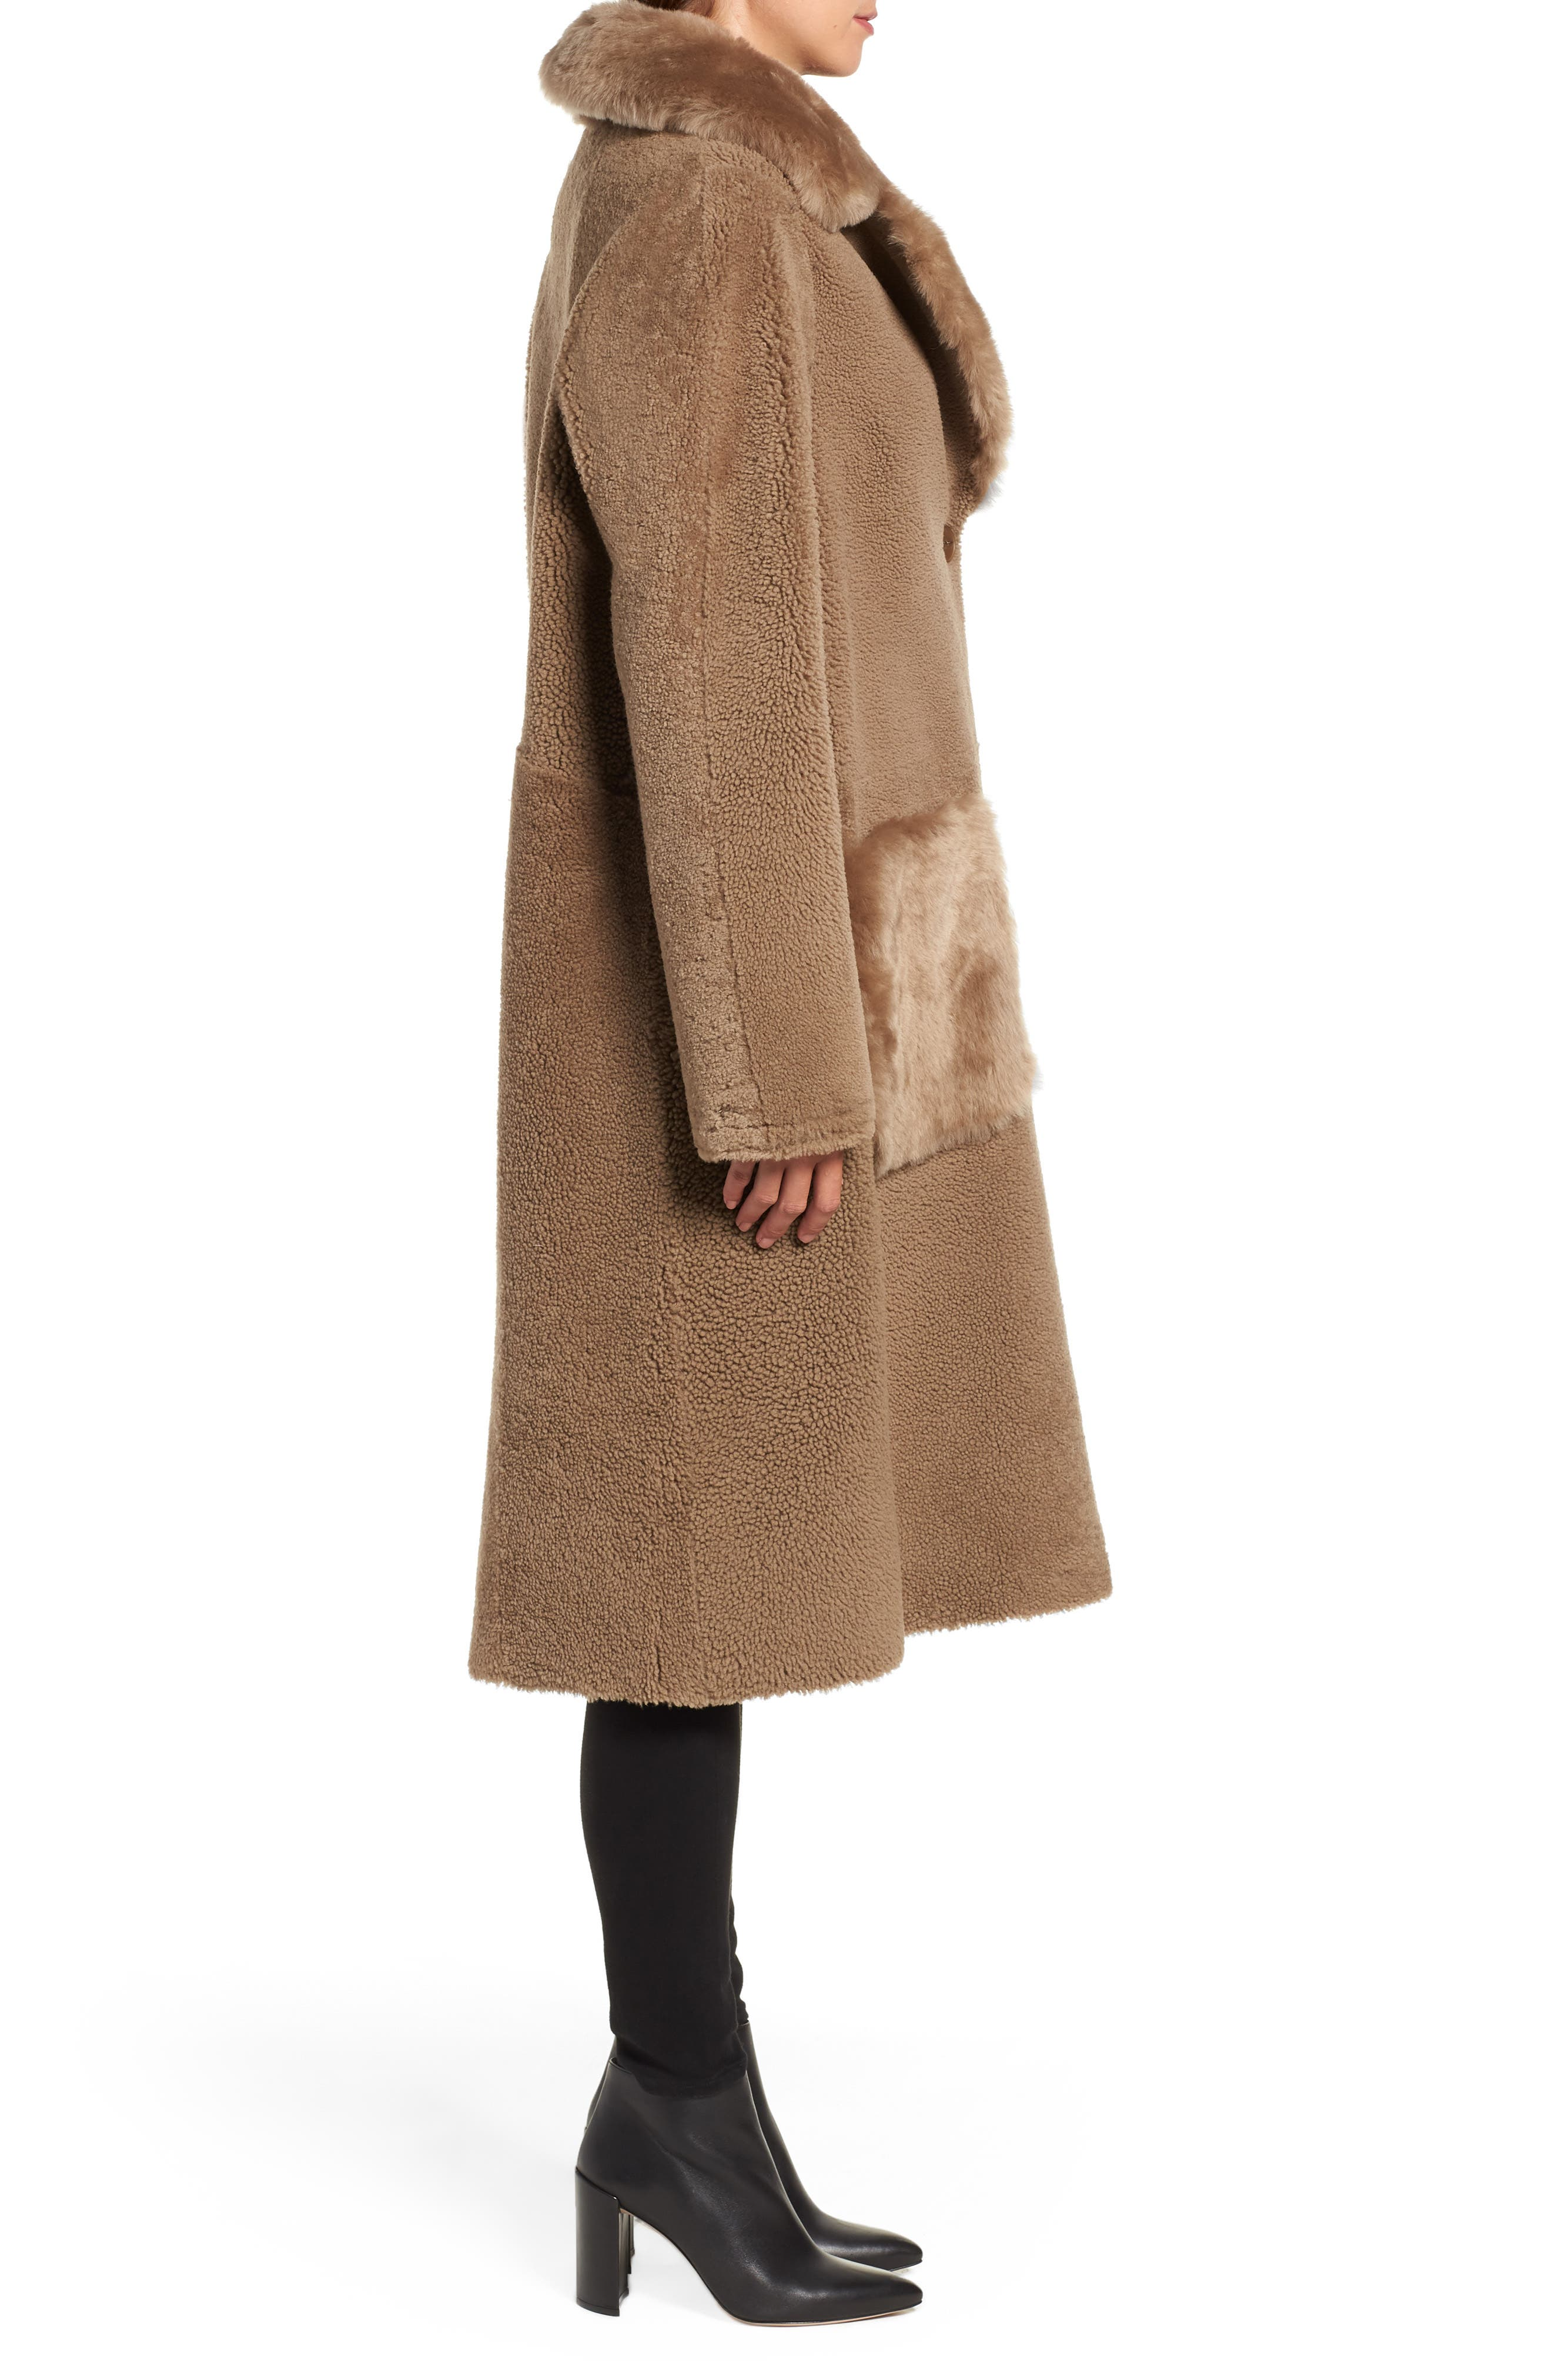 HISO,                             Genuine Merino Shearling Coat,                             Alternate thumbnail 3, color,                             250